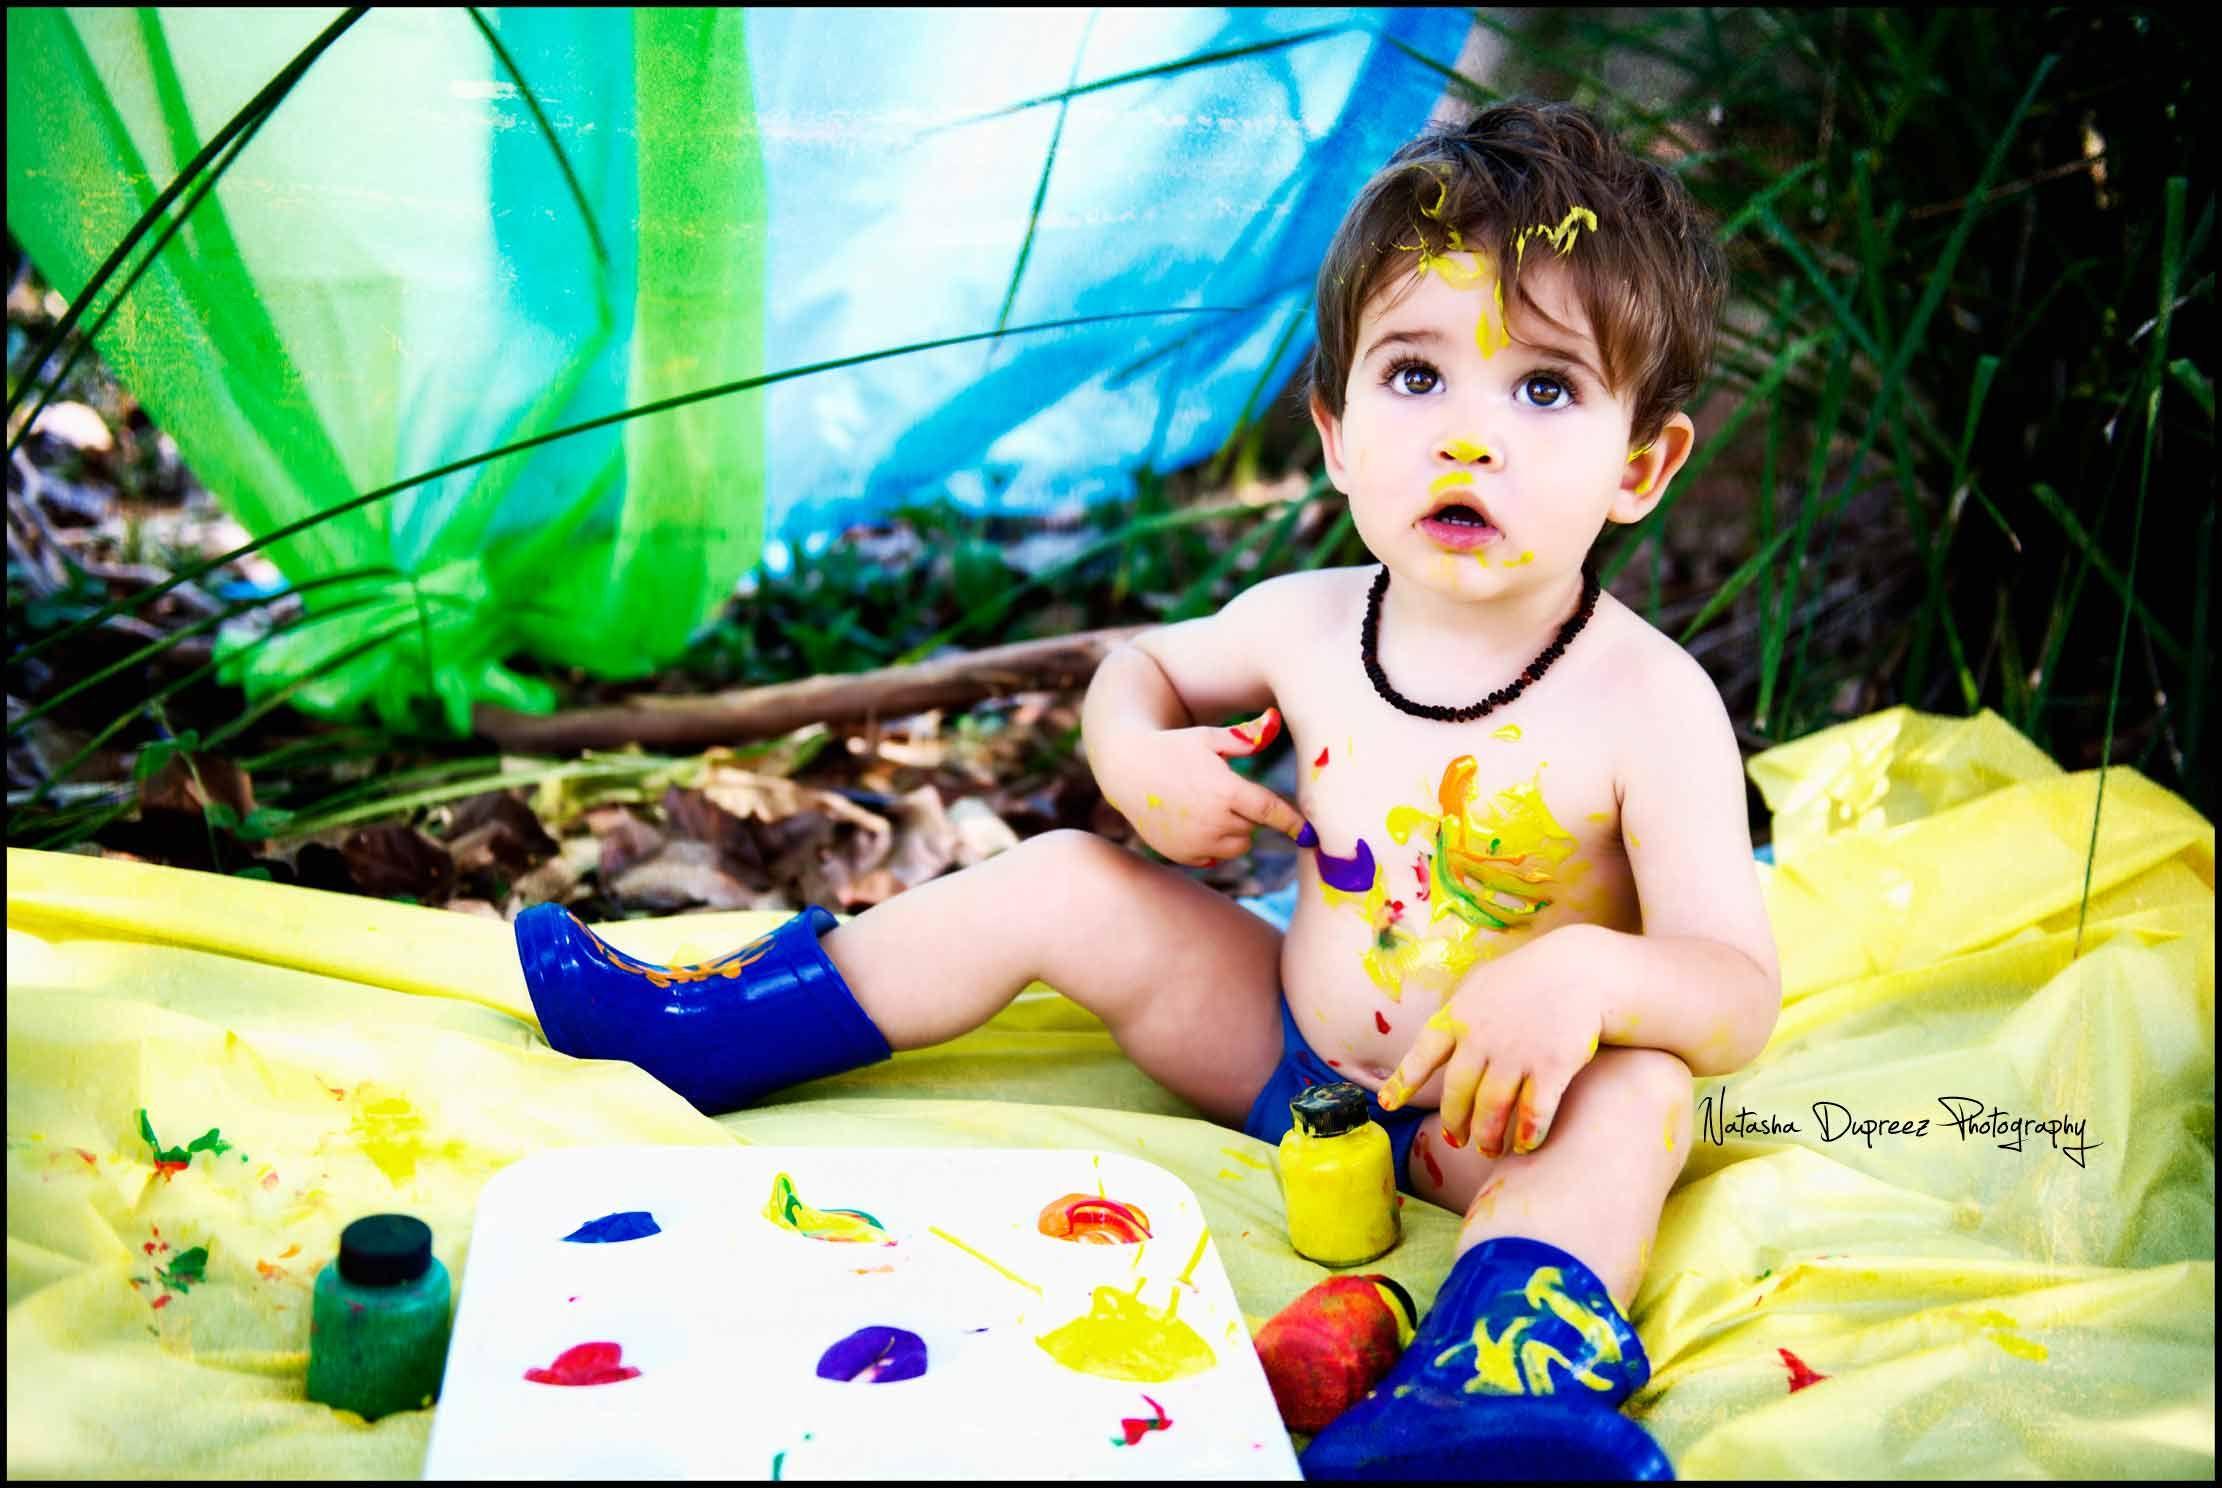 Cookies & milk, paint and bubbles photo fun session @ Natasha Dupreez Photography#childrenphotography #photography #brisbanephotographer #toddlerphotography